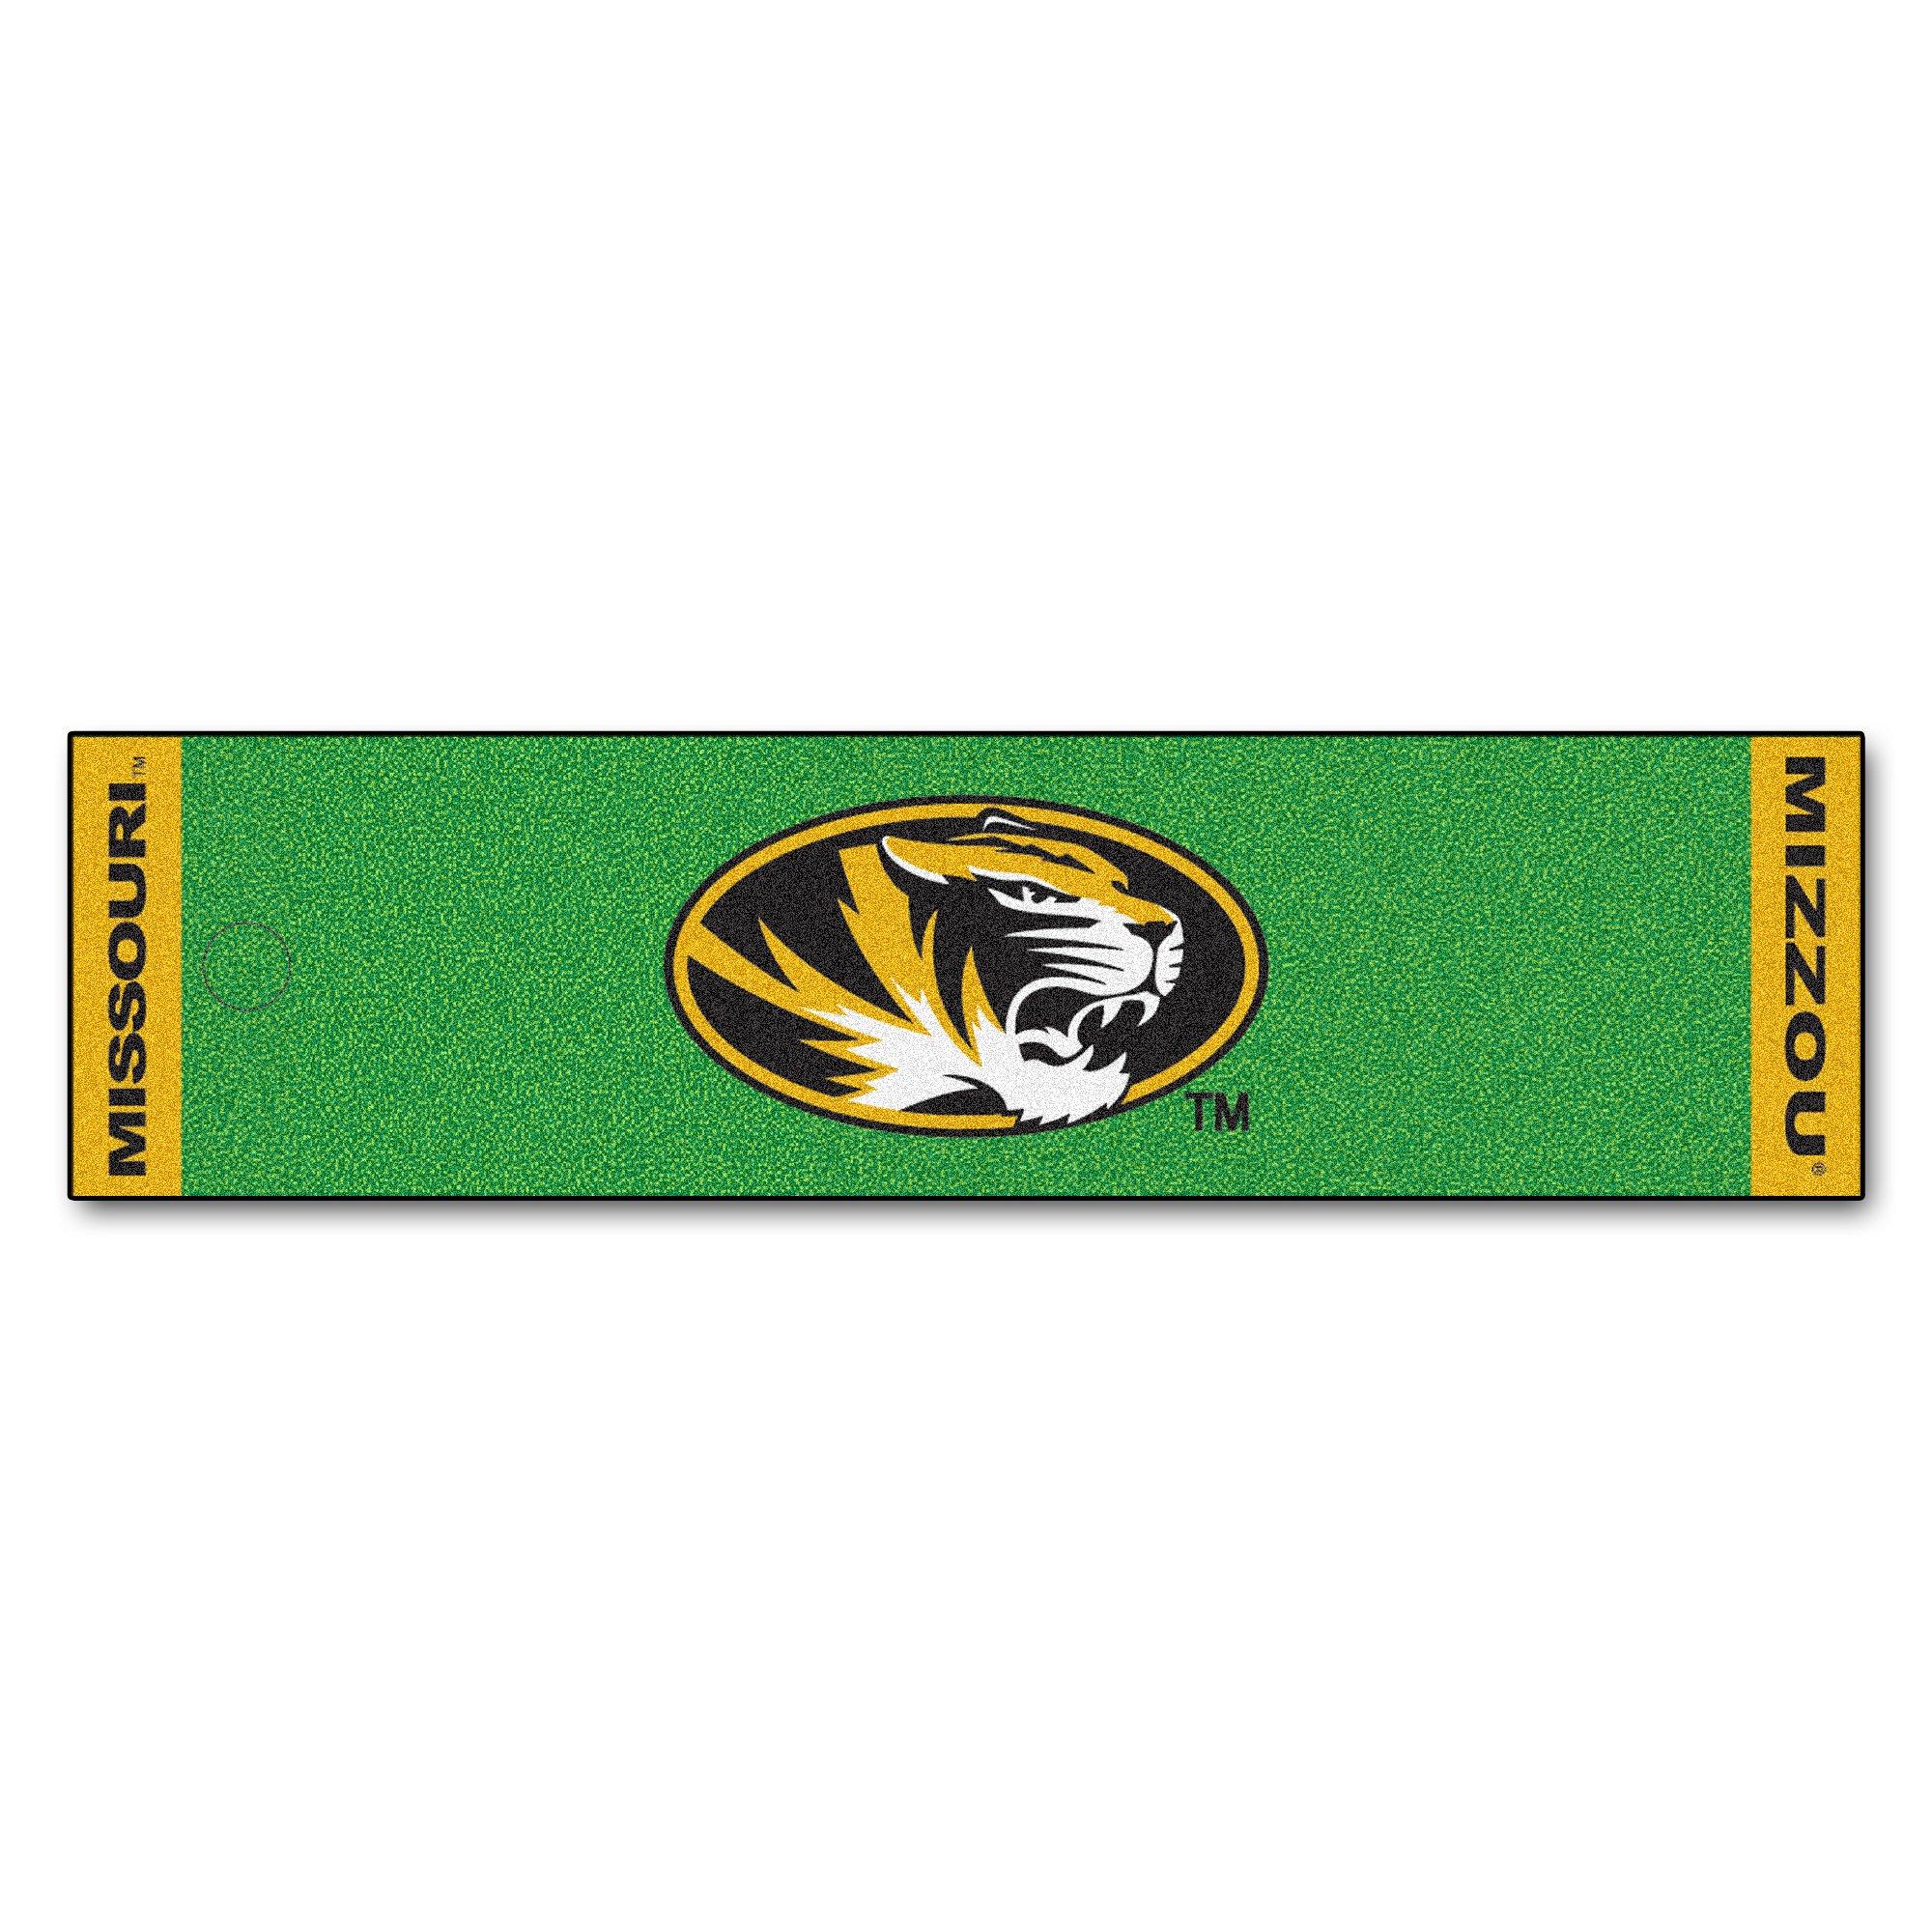 NCAA University of Missouri Tigers Putting Green Mat Golf Accessory